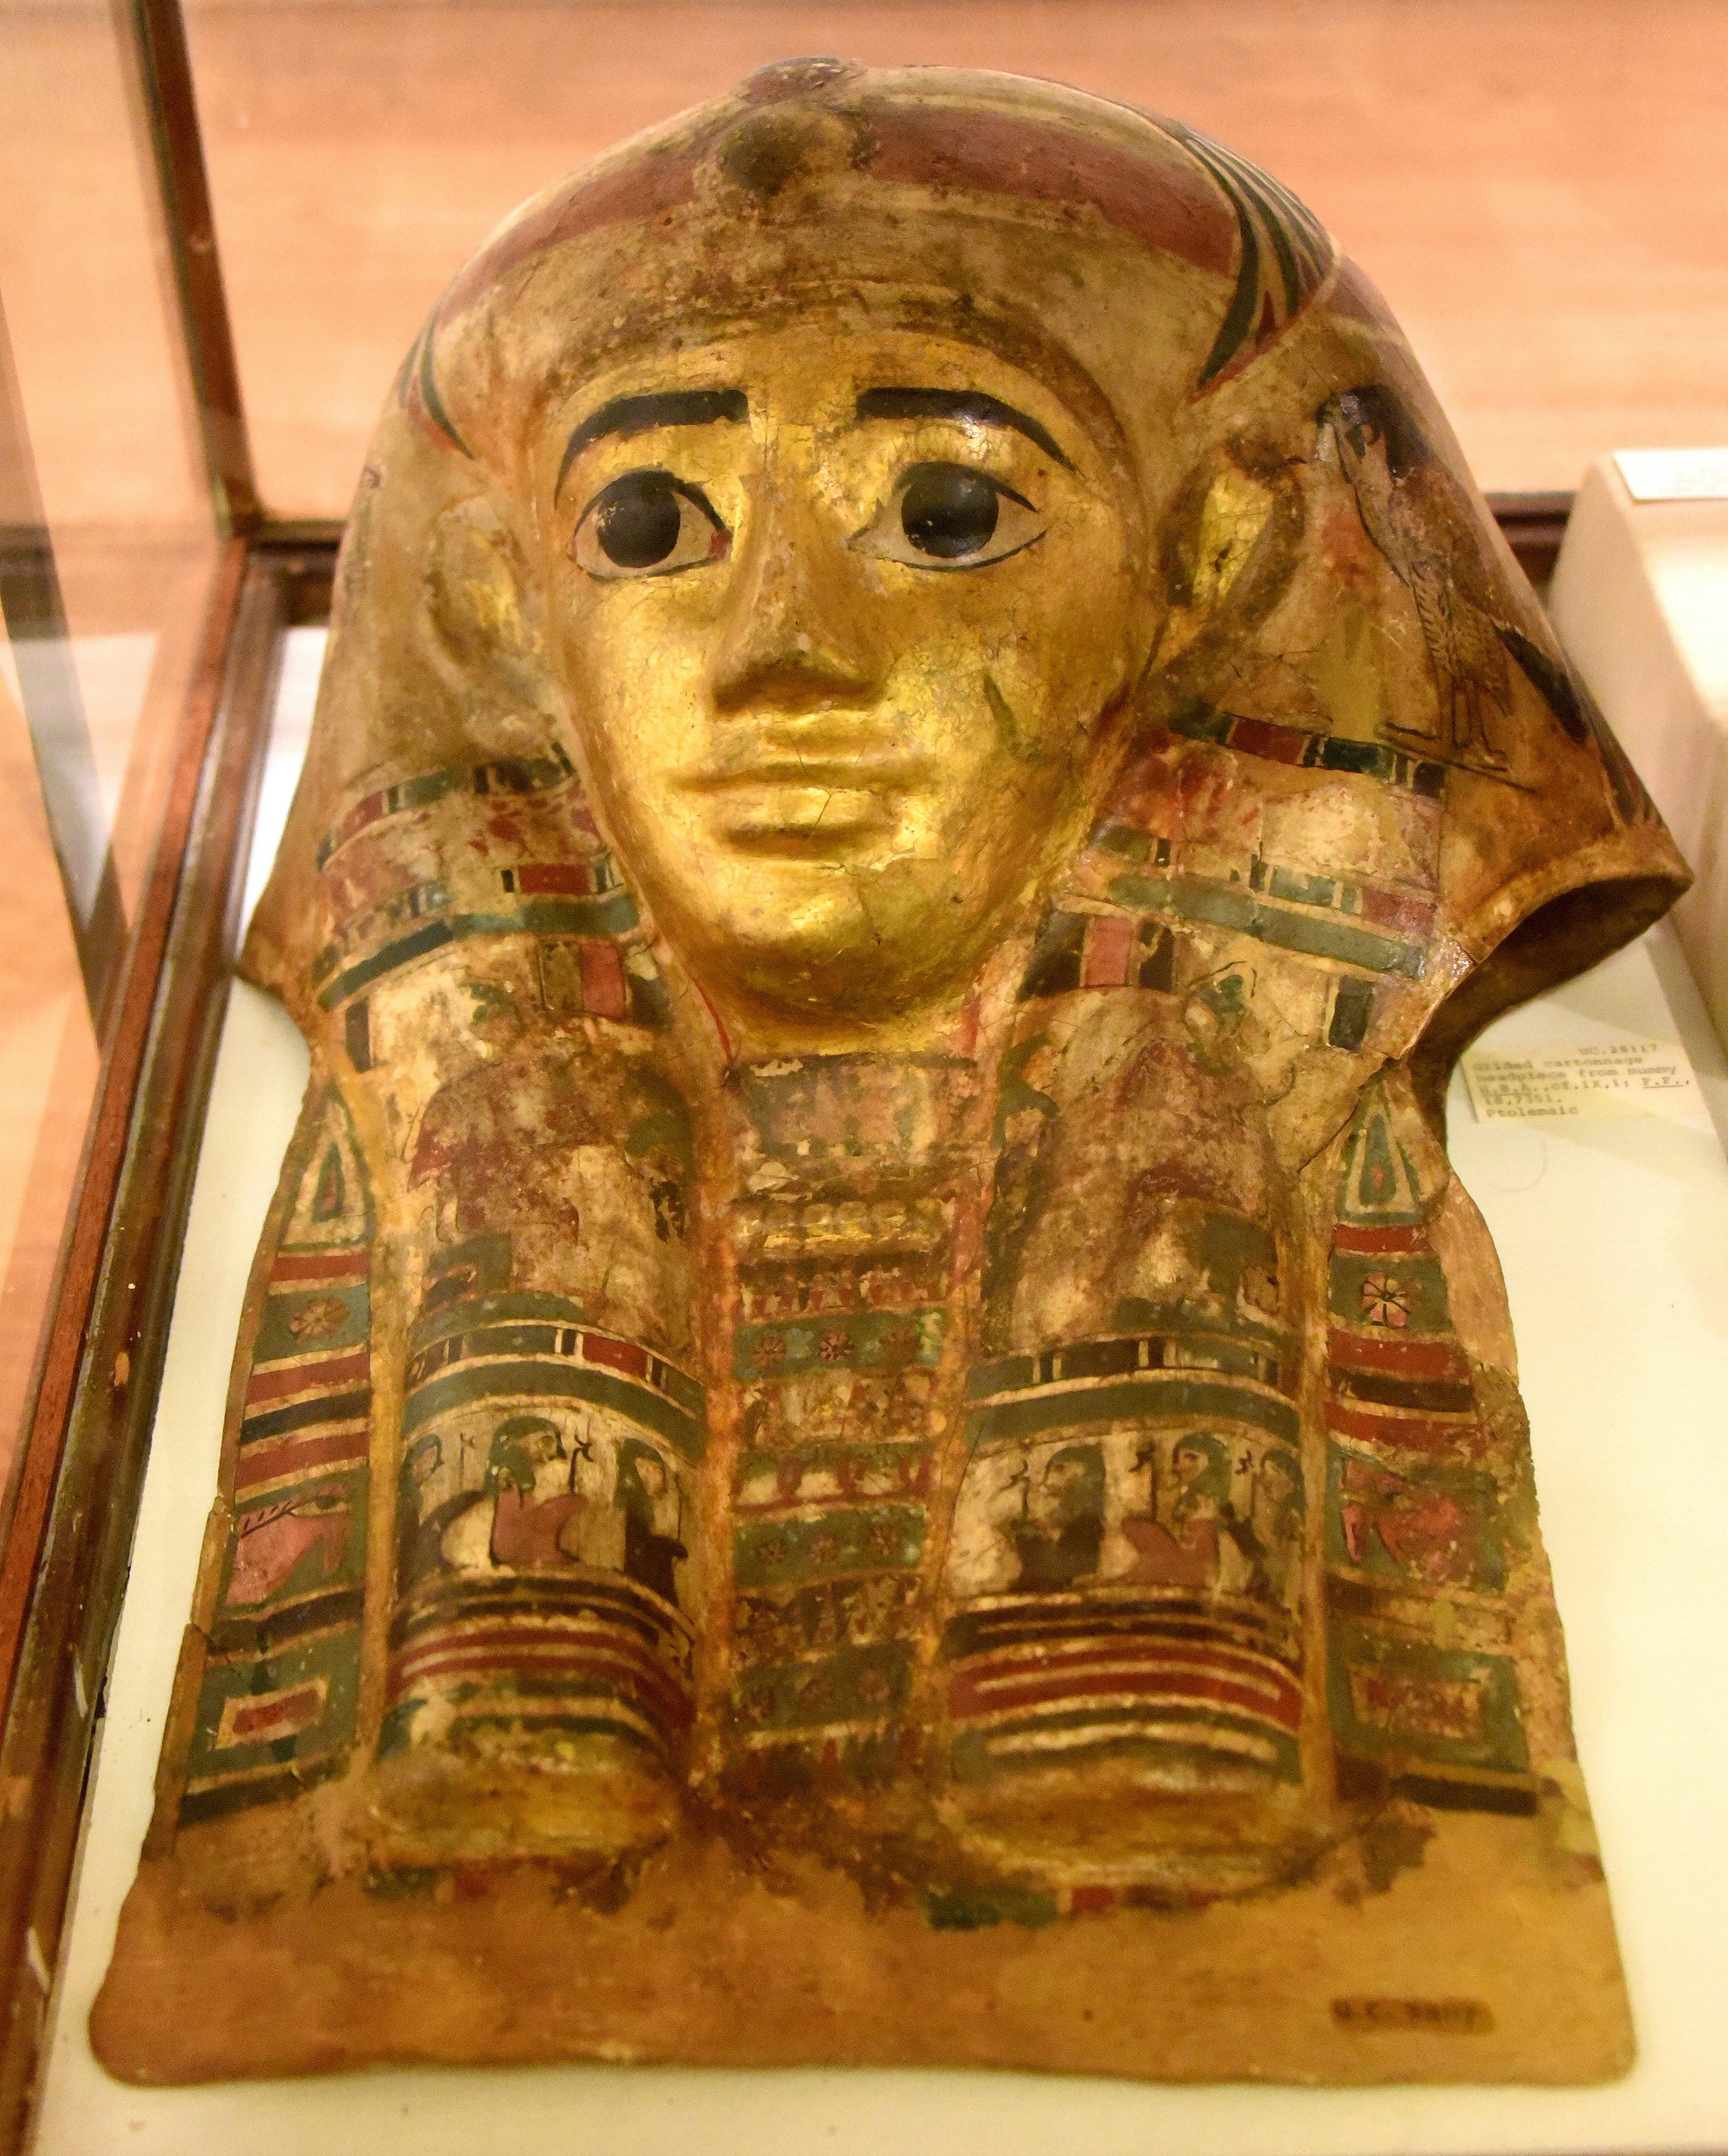 Gilded Face Mask (Illustration) - Ancient History Encyclopedia